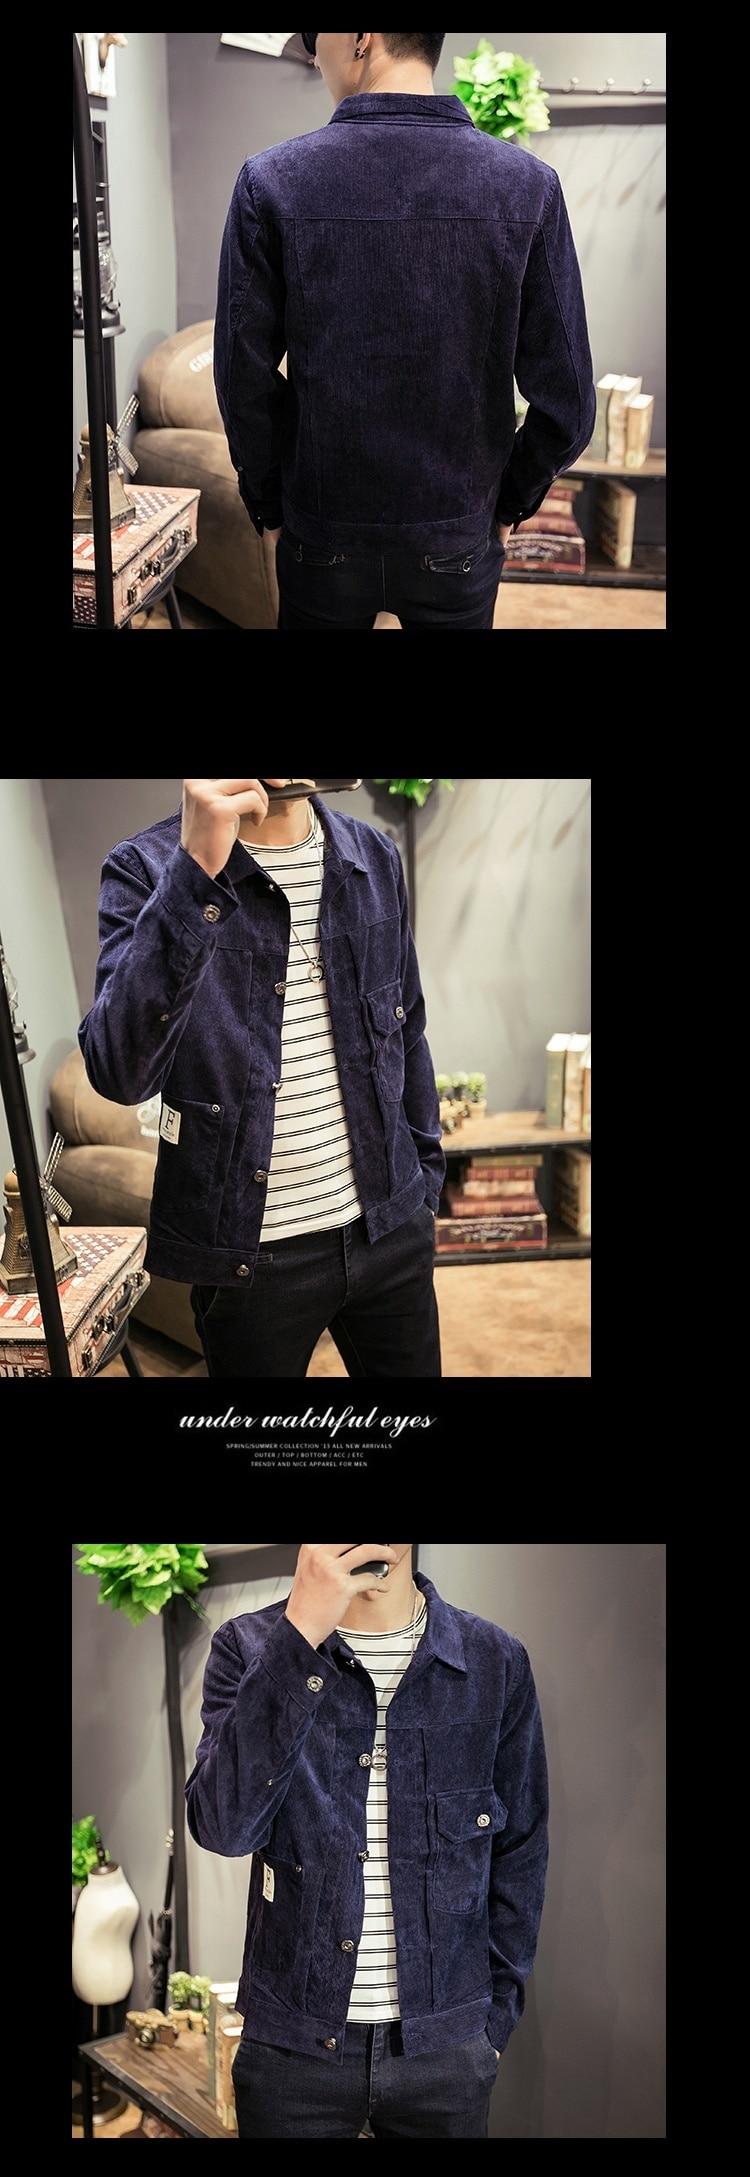 H2682b7dfd55a466fbec7d5c4281001e4f Zongke Japan Style Corduroy Jacket Men Hip Hop Streetwear Men Jacket Coat Windbreaker Clothes Bomber Jacket Men 5XL 2019 New